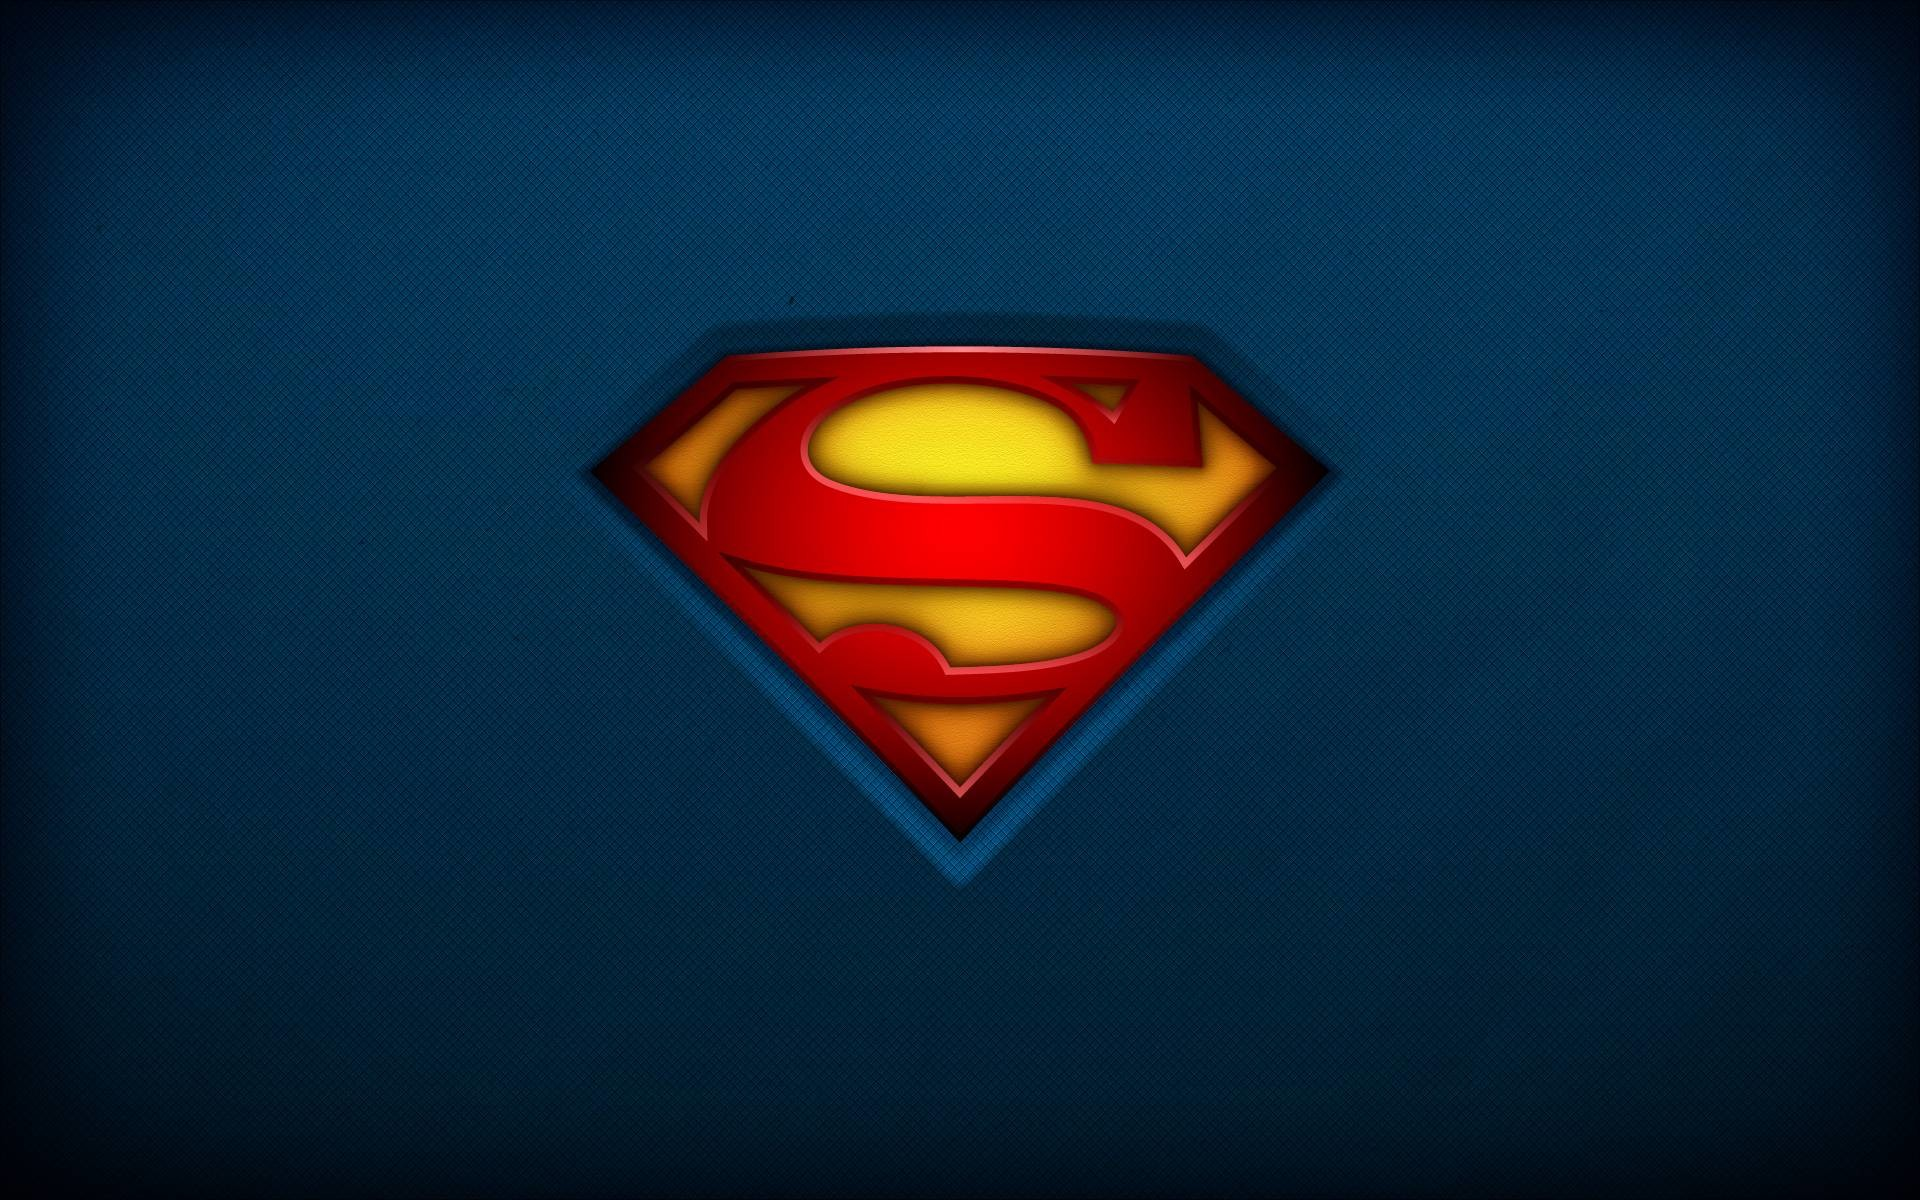 Superman Logo Iphone Wallpaper Hd 65 Images